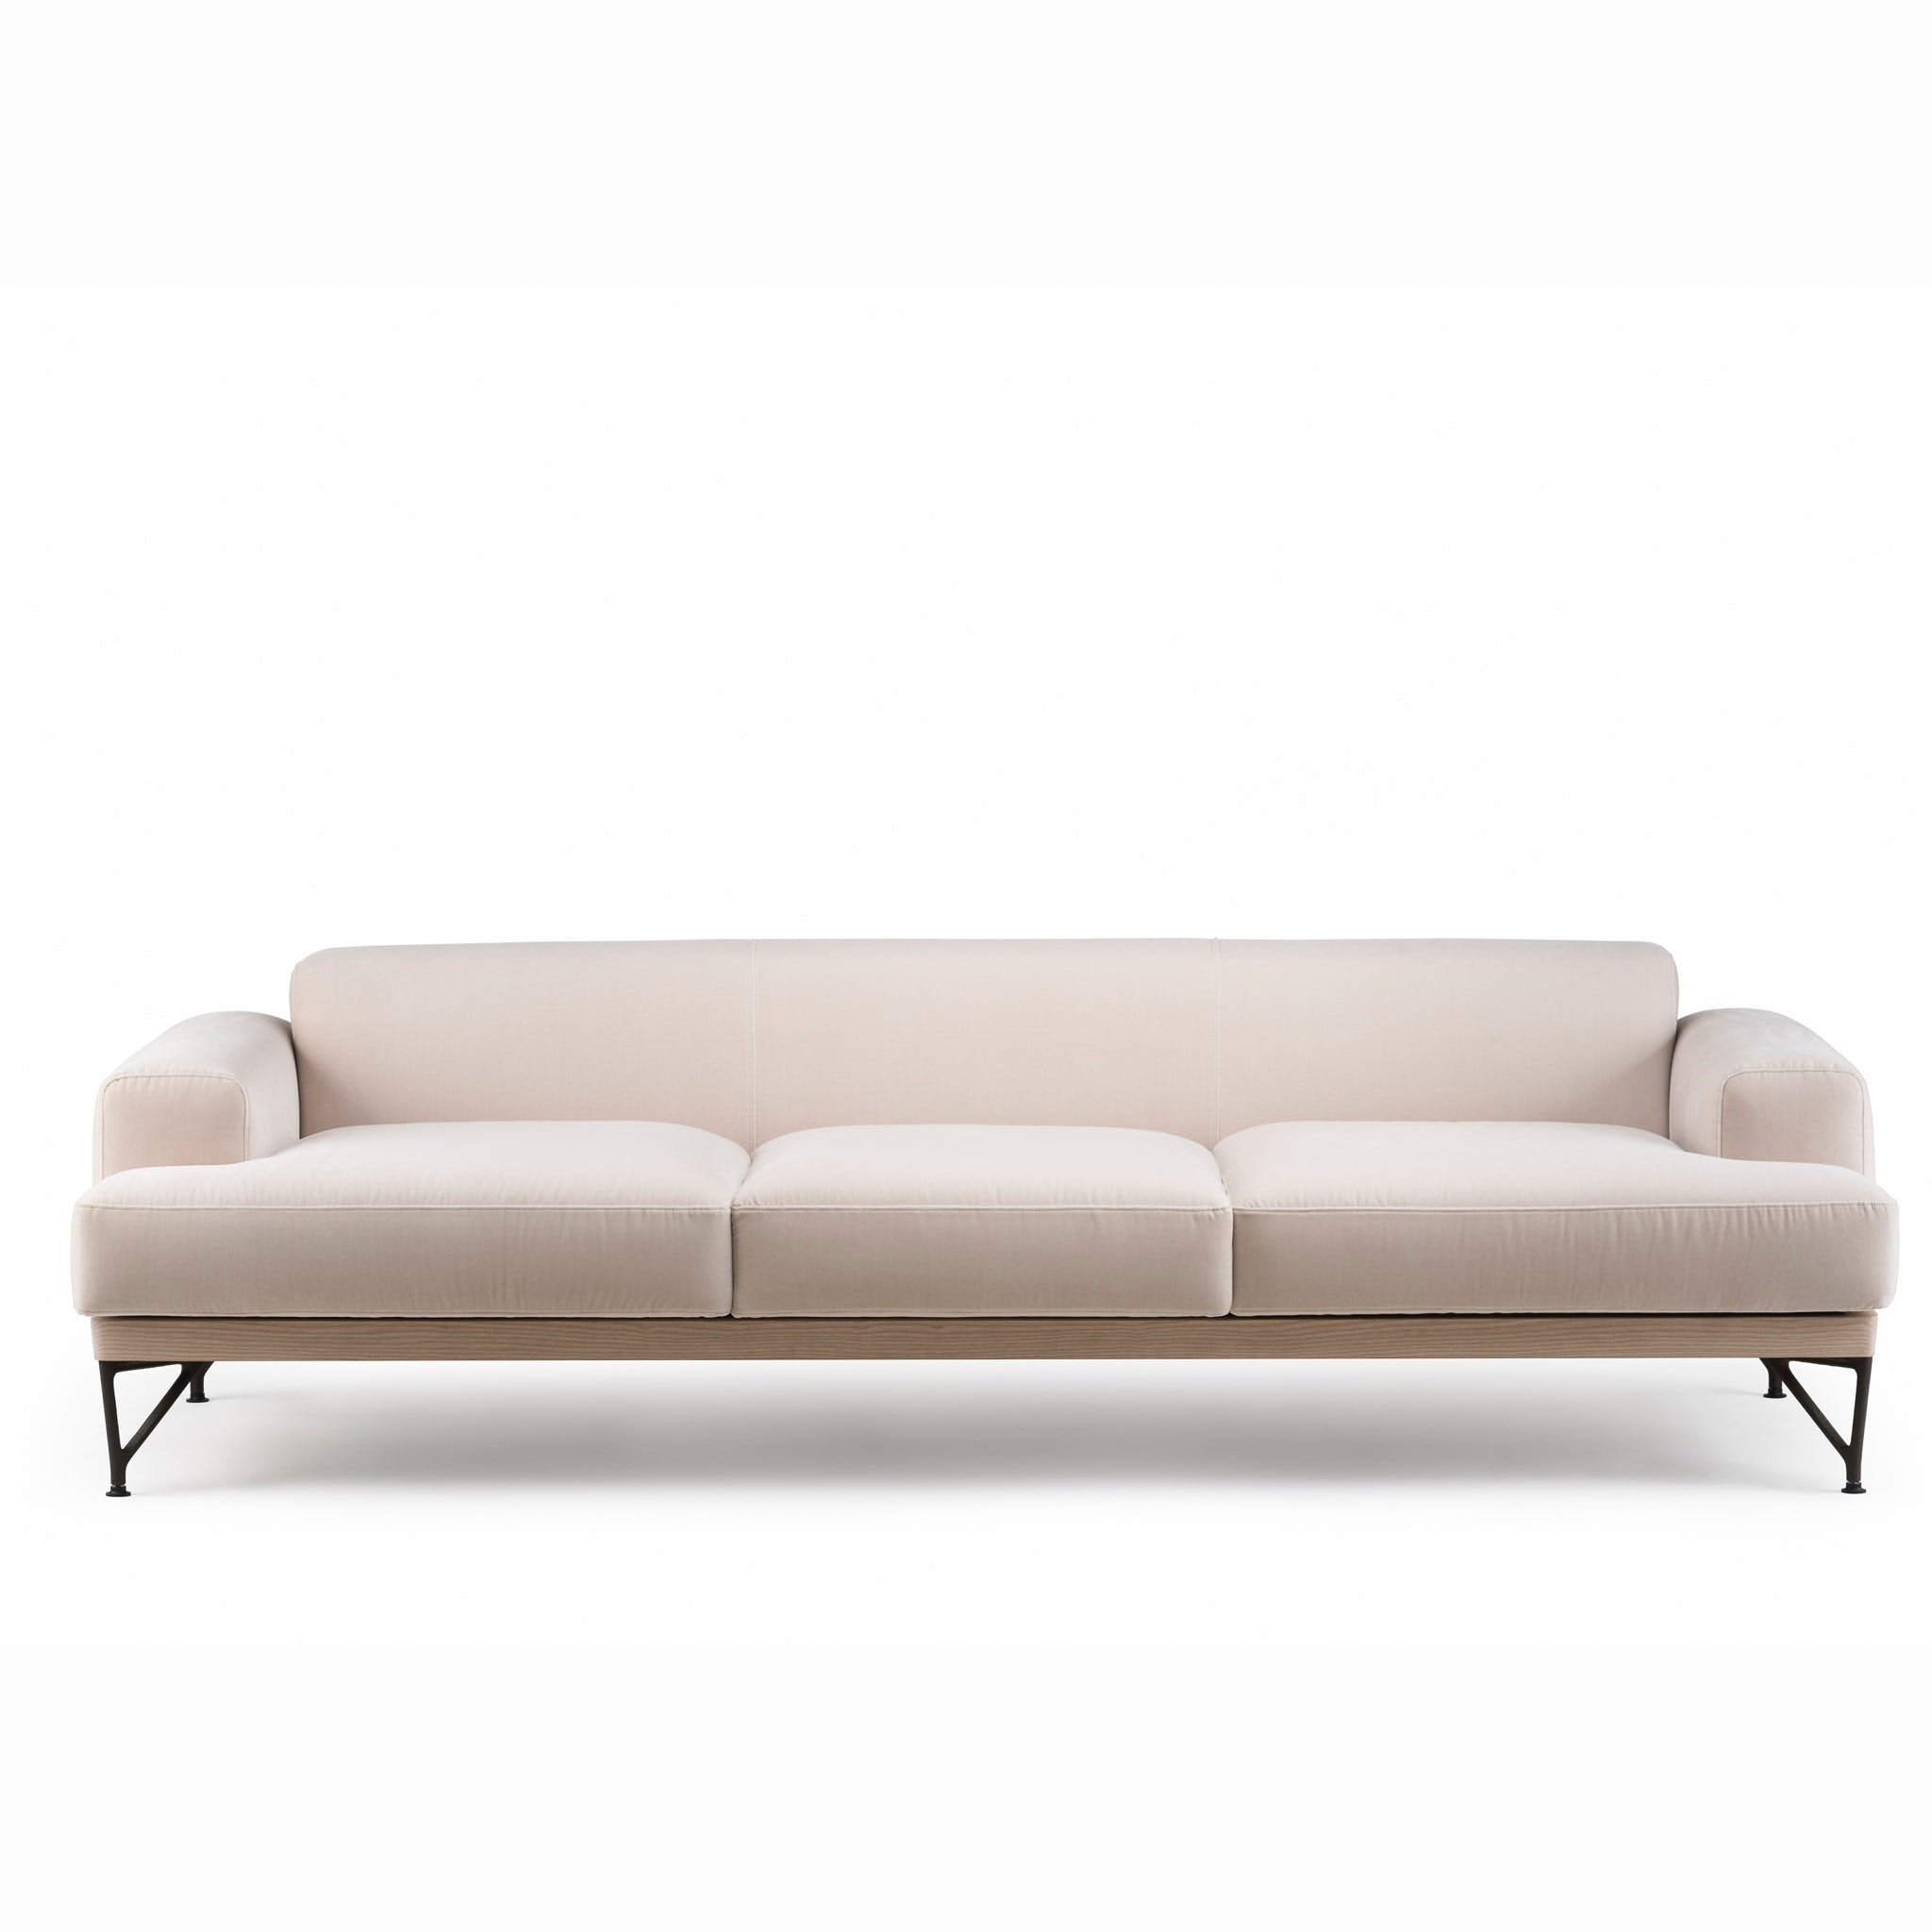 Armstrong Sofa By Matthew Hilton Haus 174